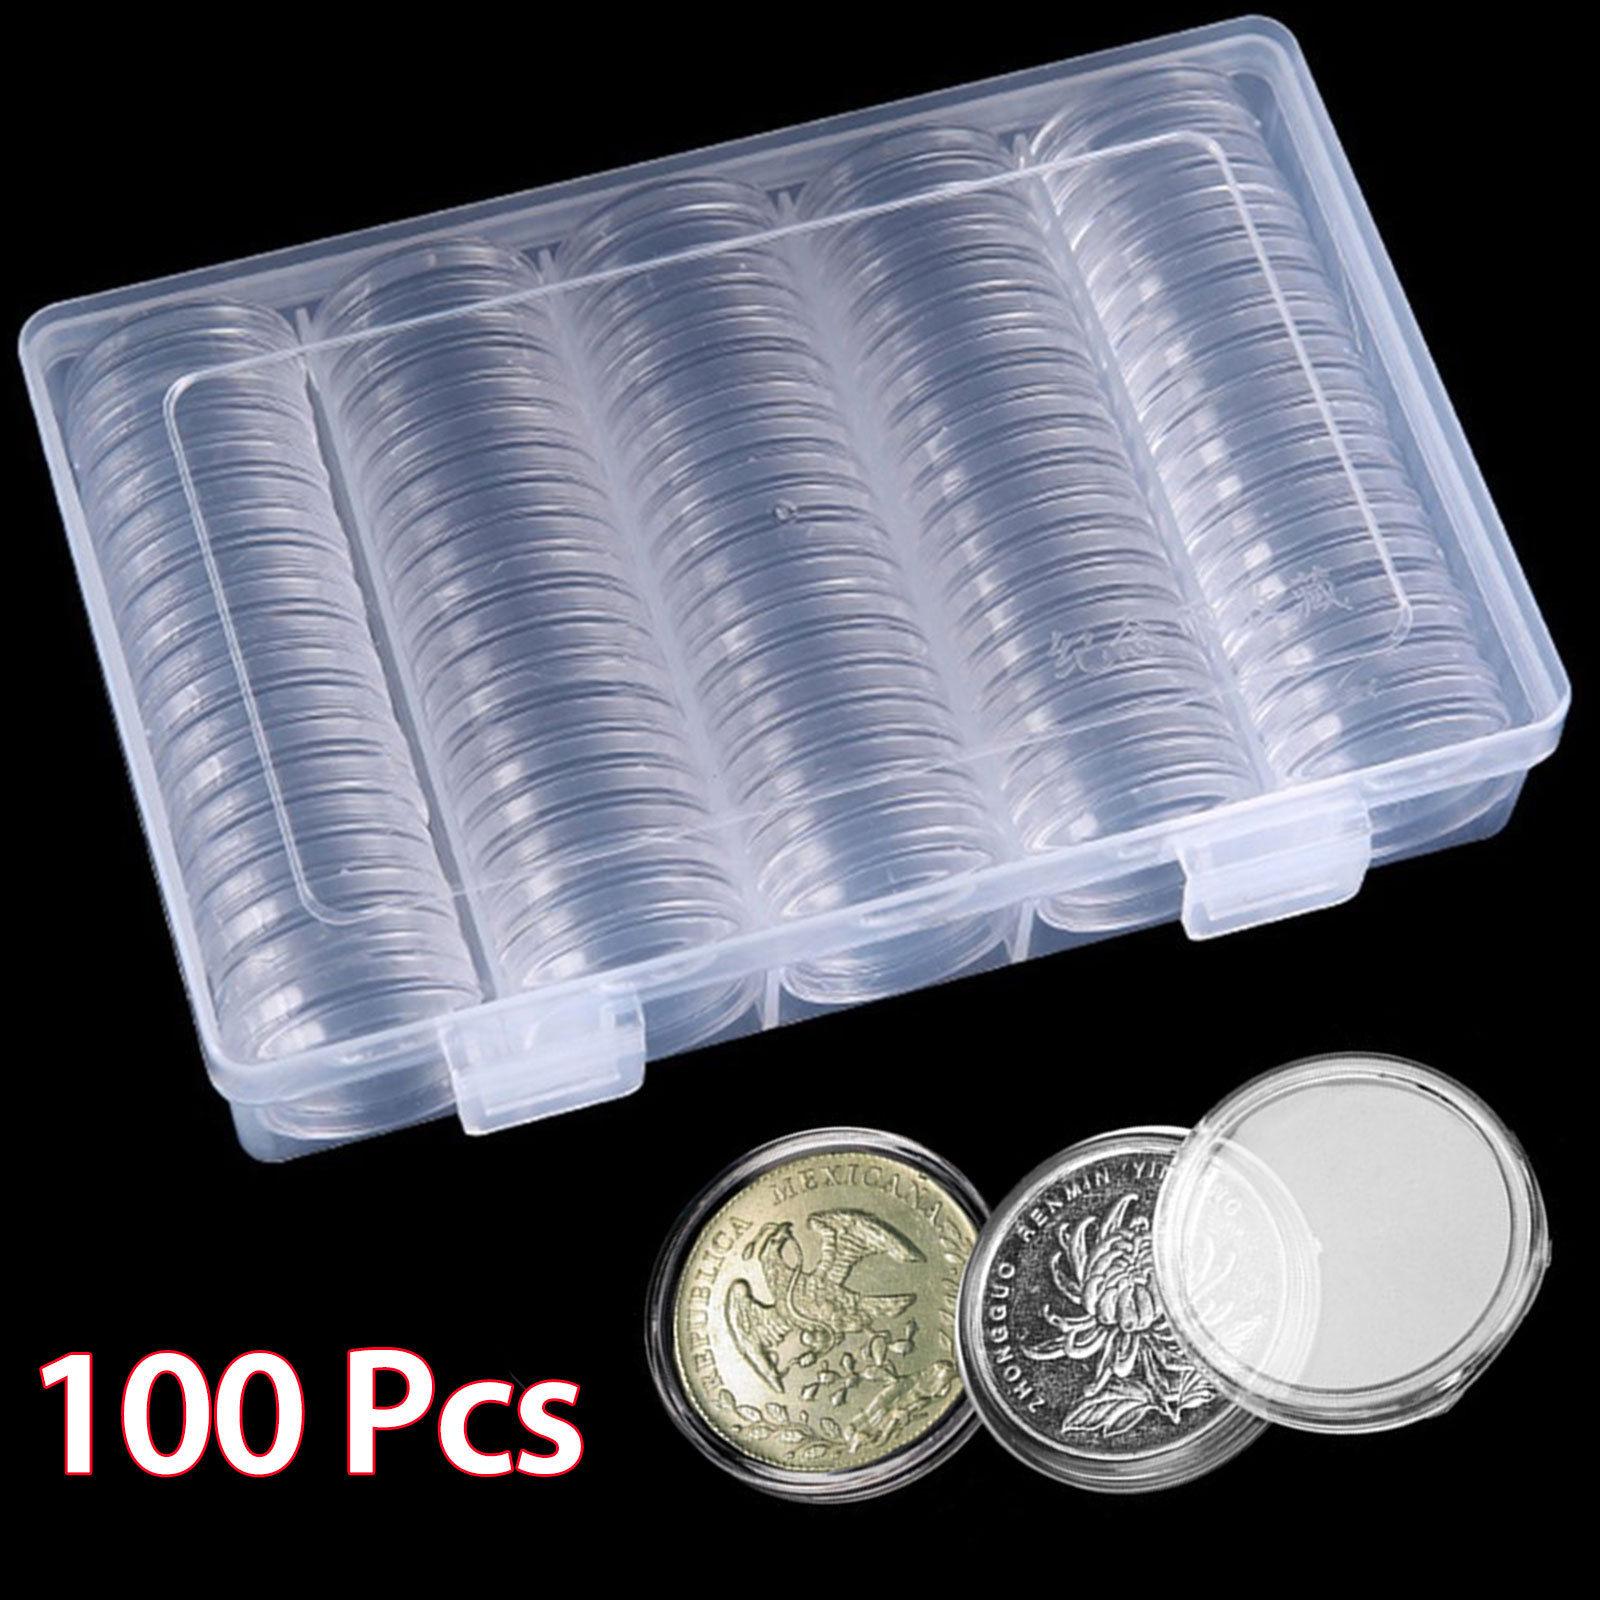 100 шт. прозрачный Пластик монетница бумажник под Коробка Чехол для монет капсулы для хранения защиты Коробки контейнер 30 мм/27 мм